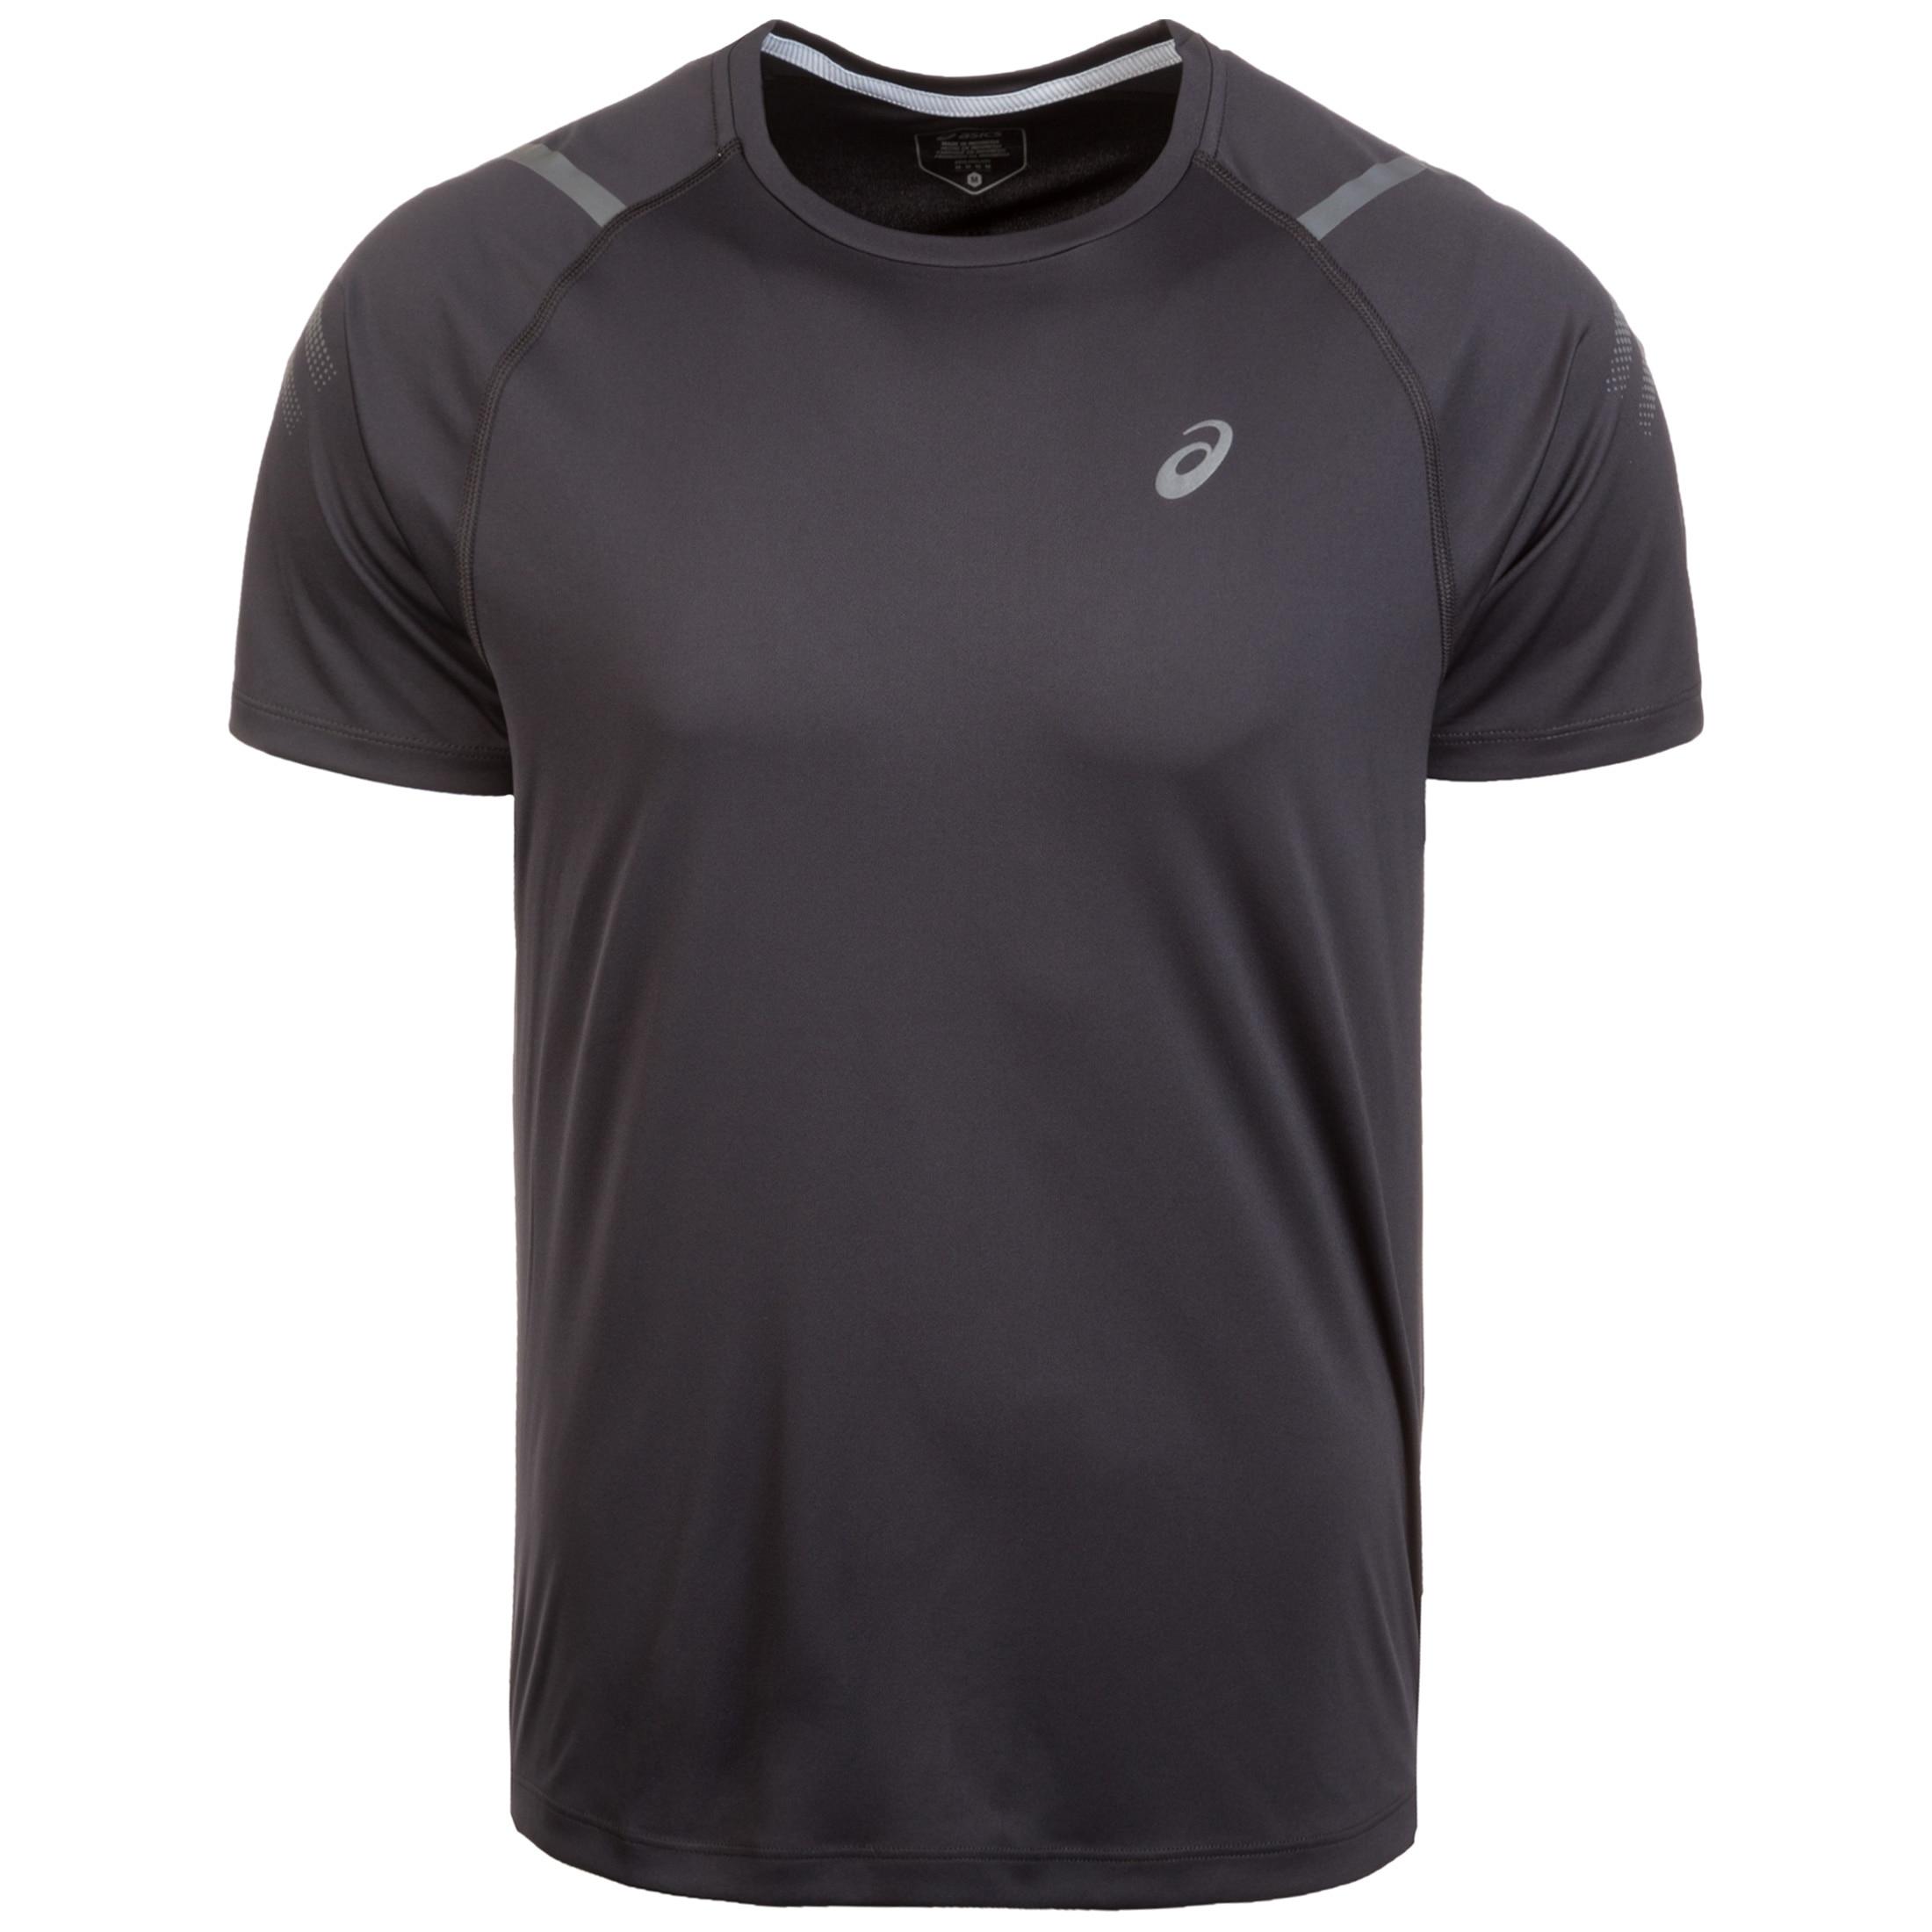 Asics Laufshirt Icon | Sportbekleidung > Sportshirts > Laufshirts | Schwarz | Asics